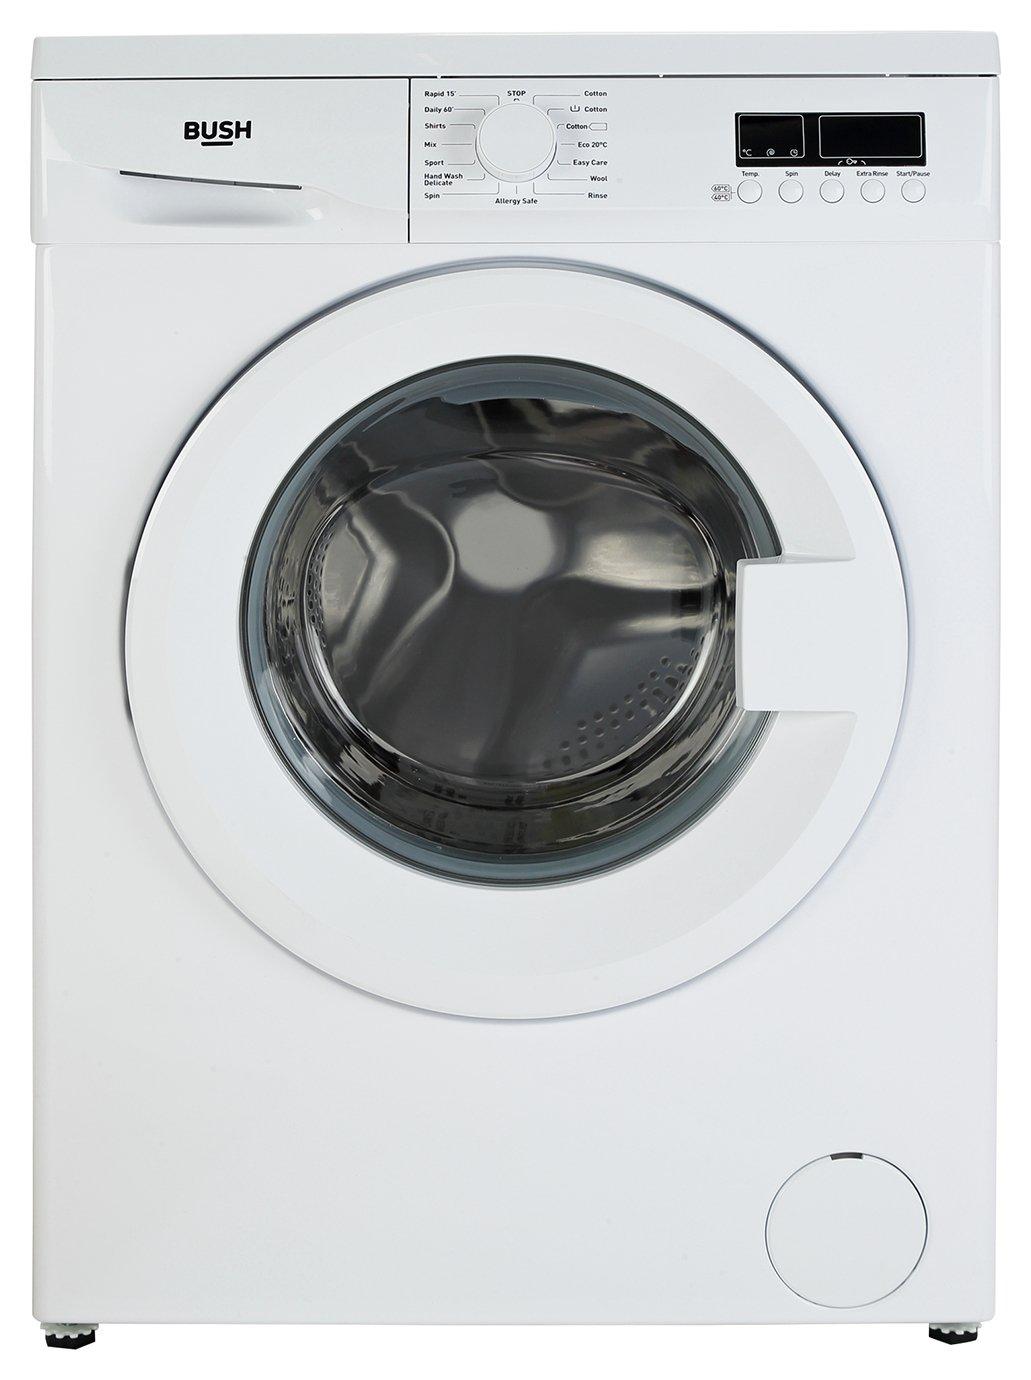 Image of Bush WMDF914W 9KG Washing Machine - White